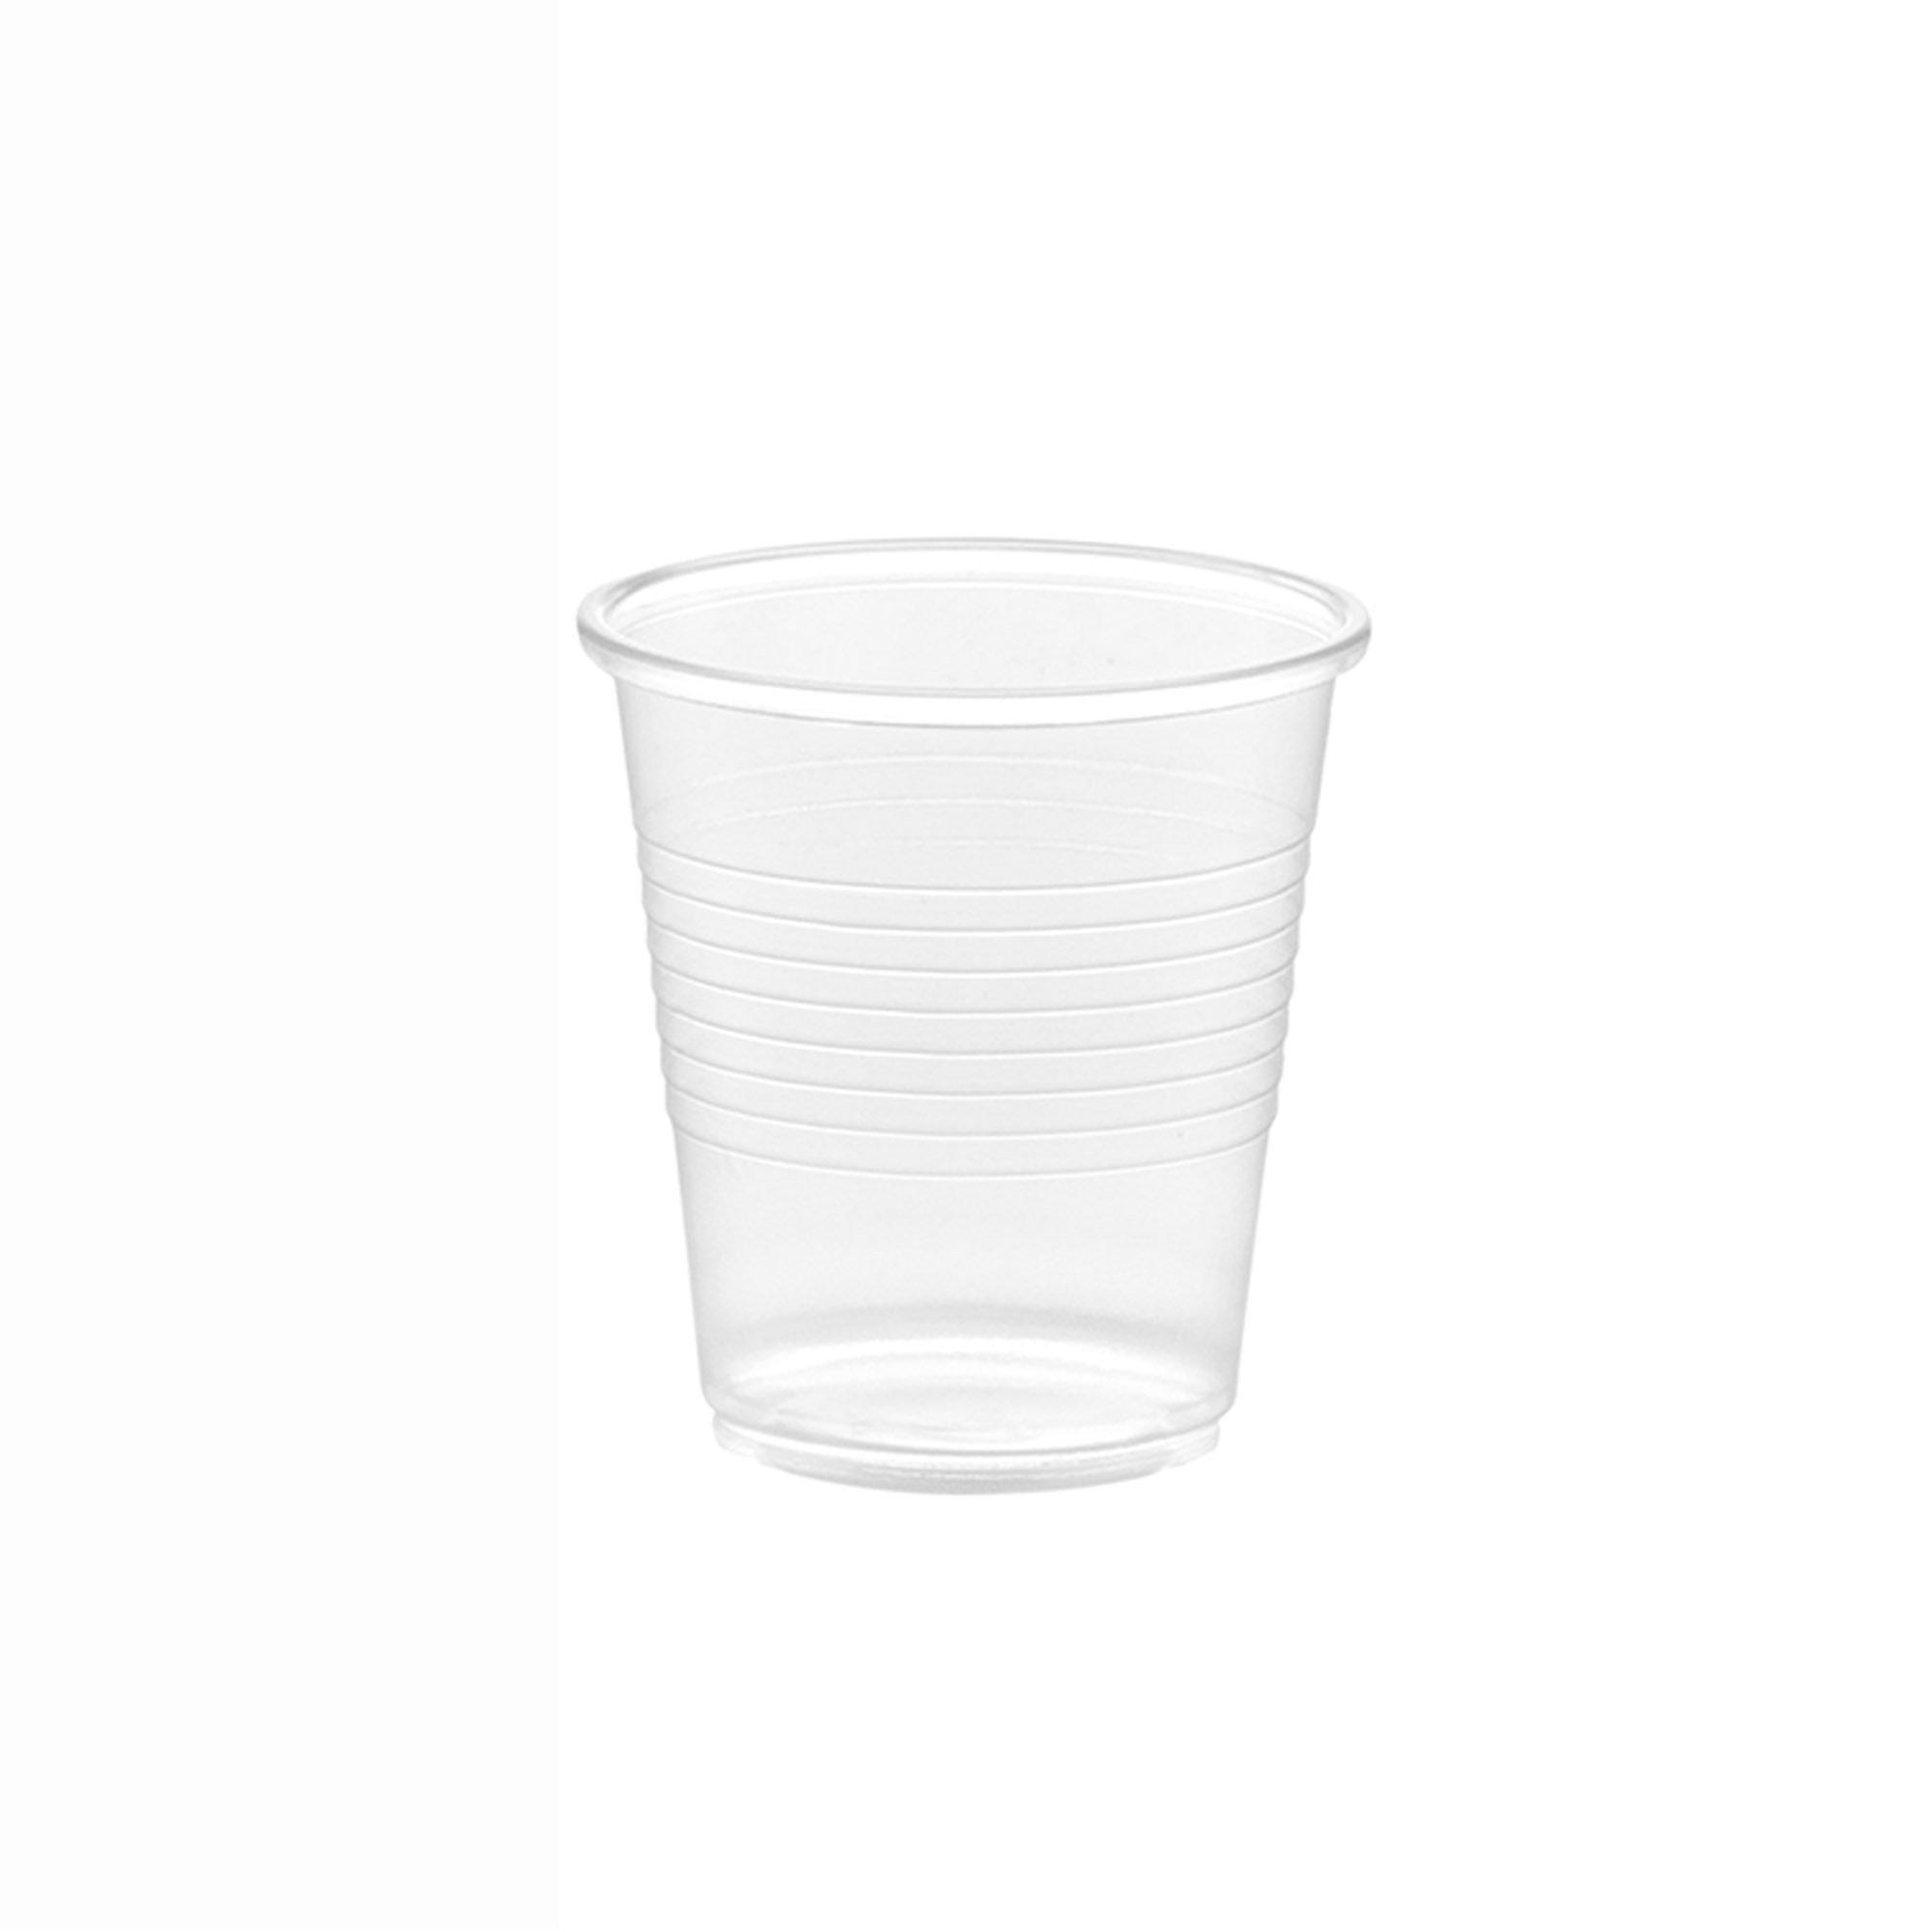 100 Pack Disposoware 3 oz Disposable Plastic Cups